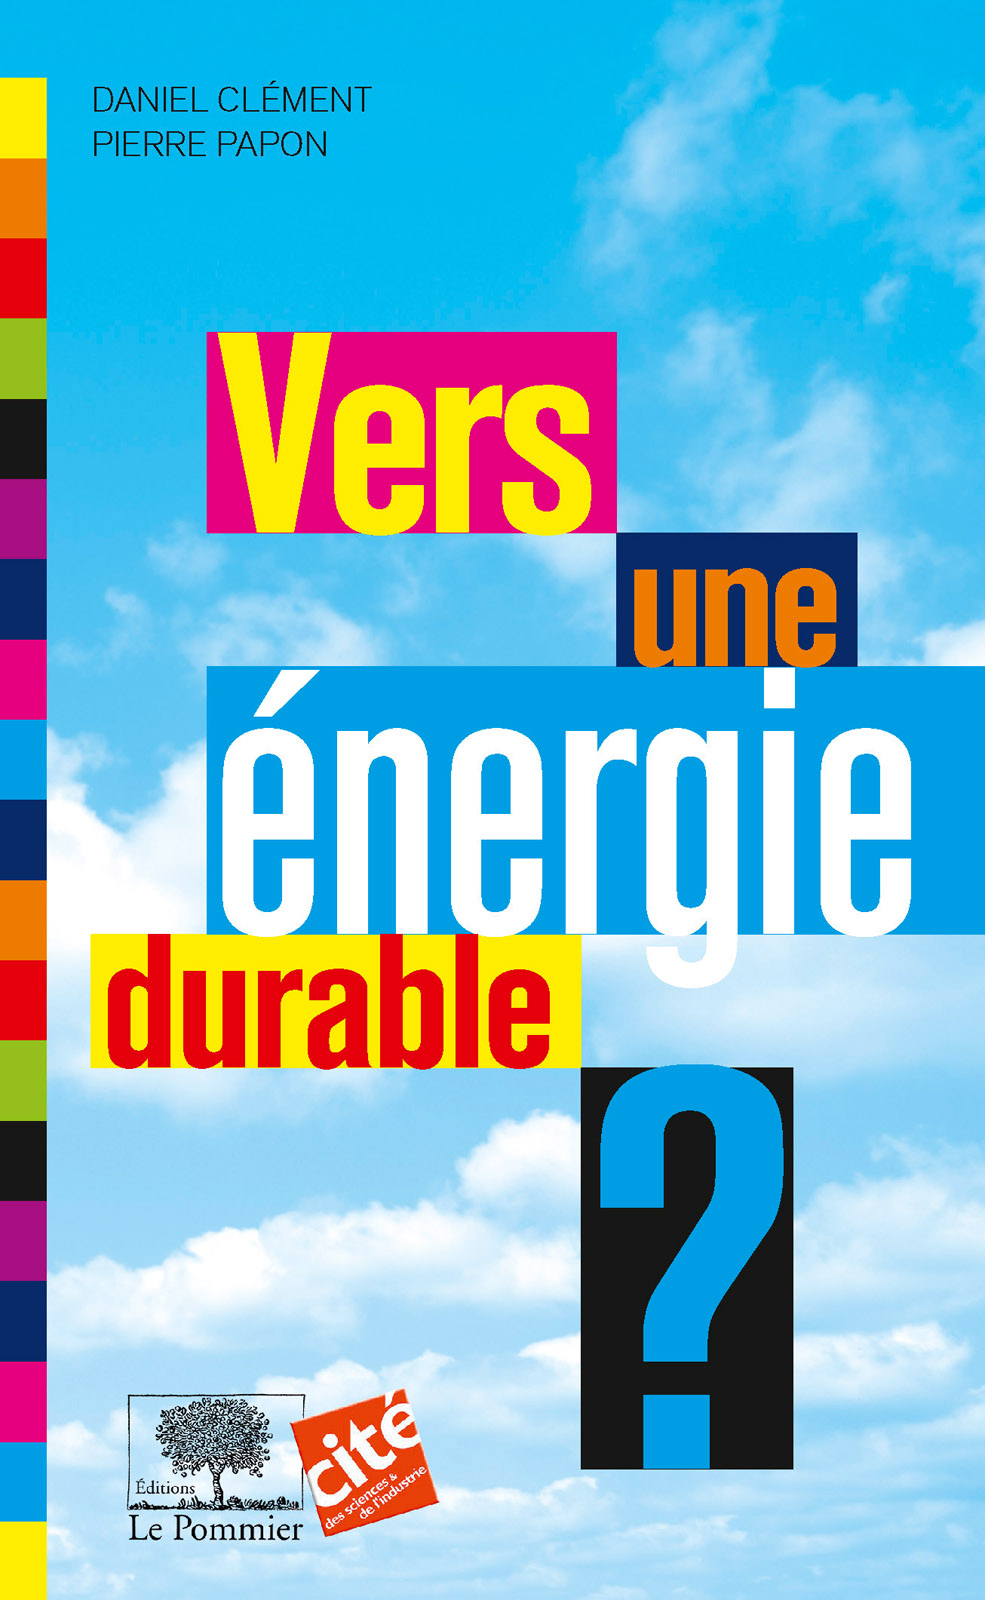 Vers une énergie durable